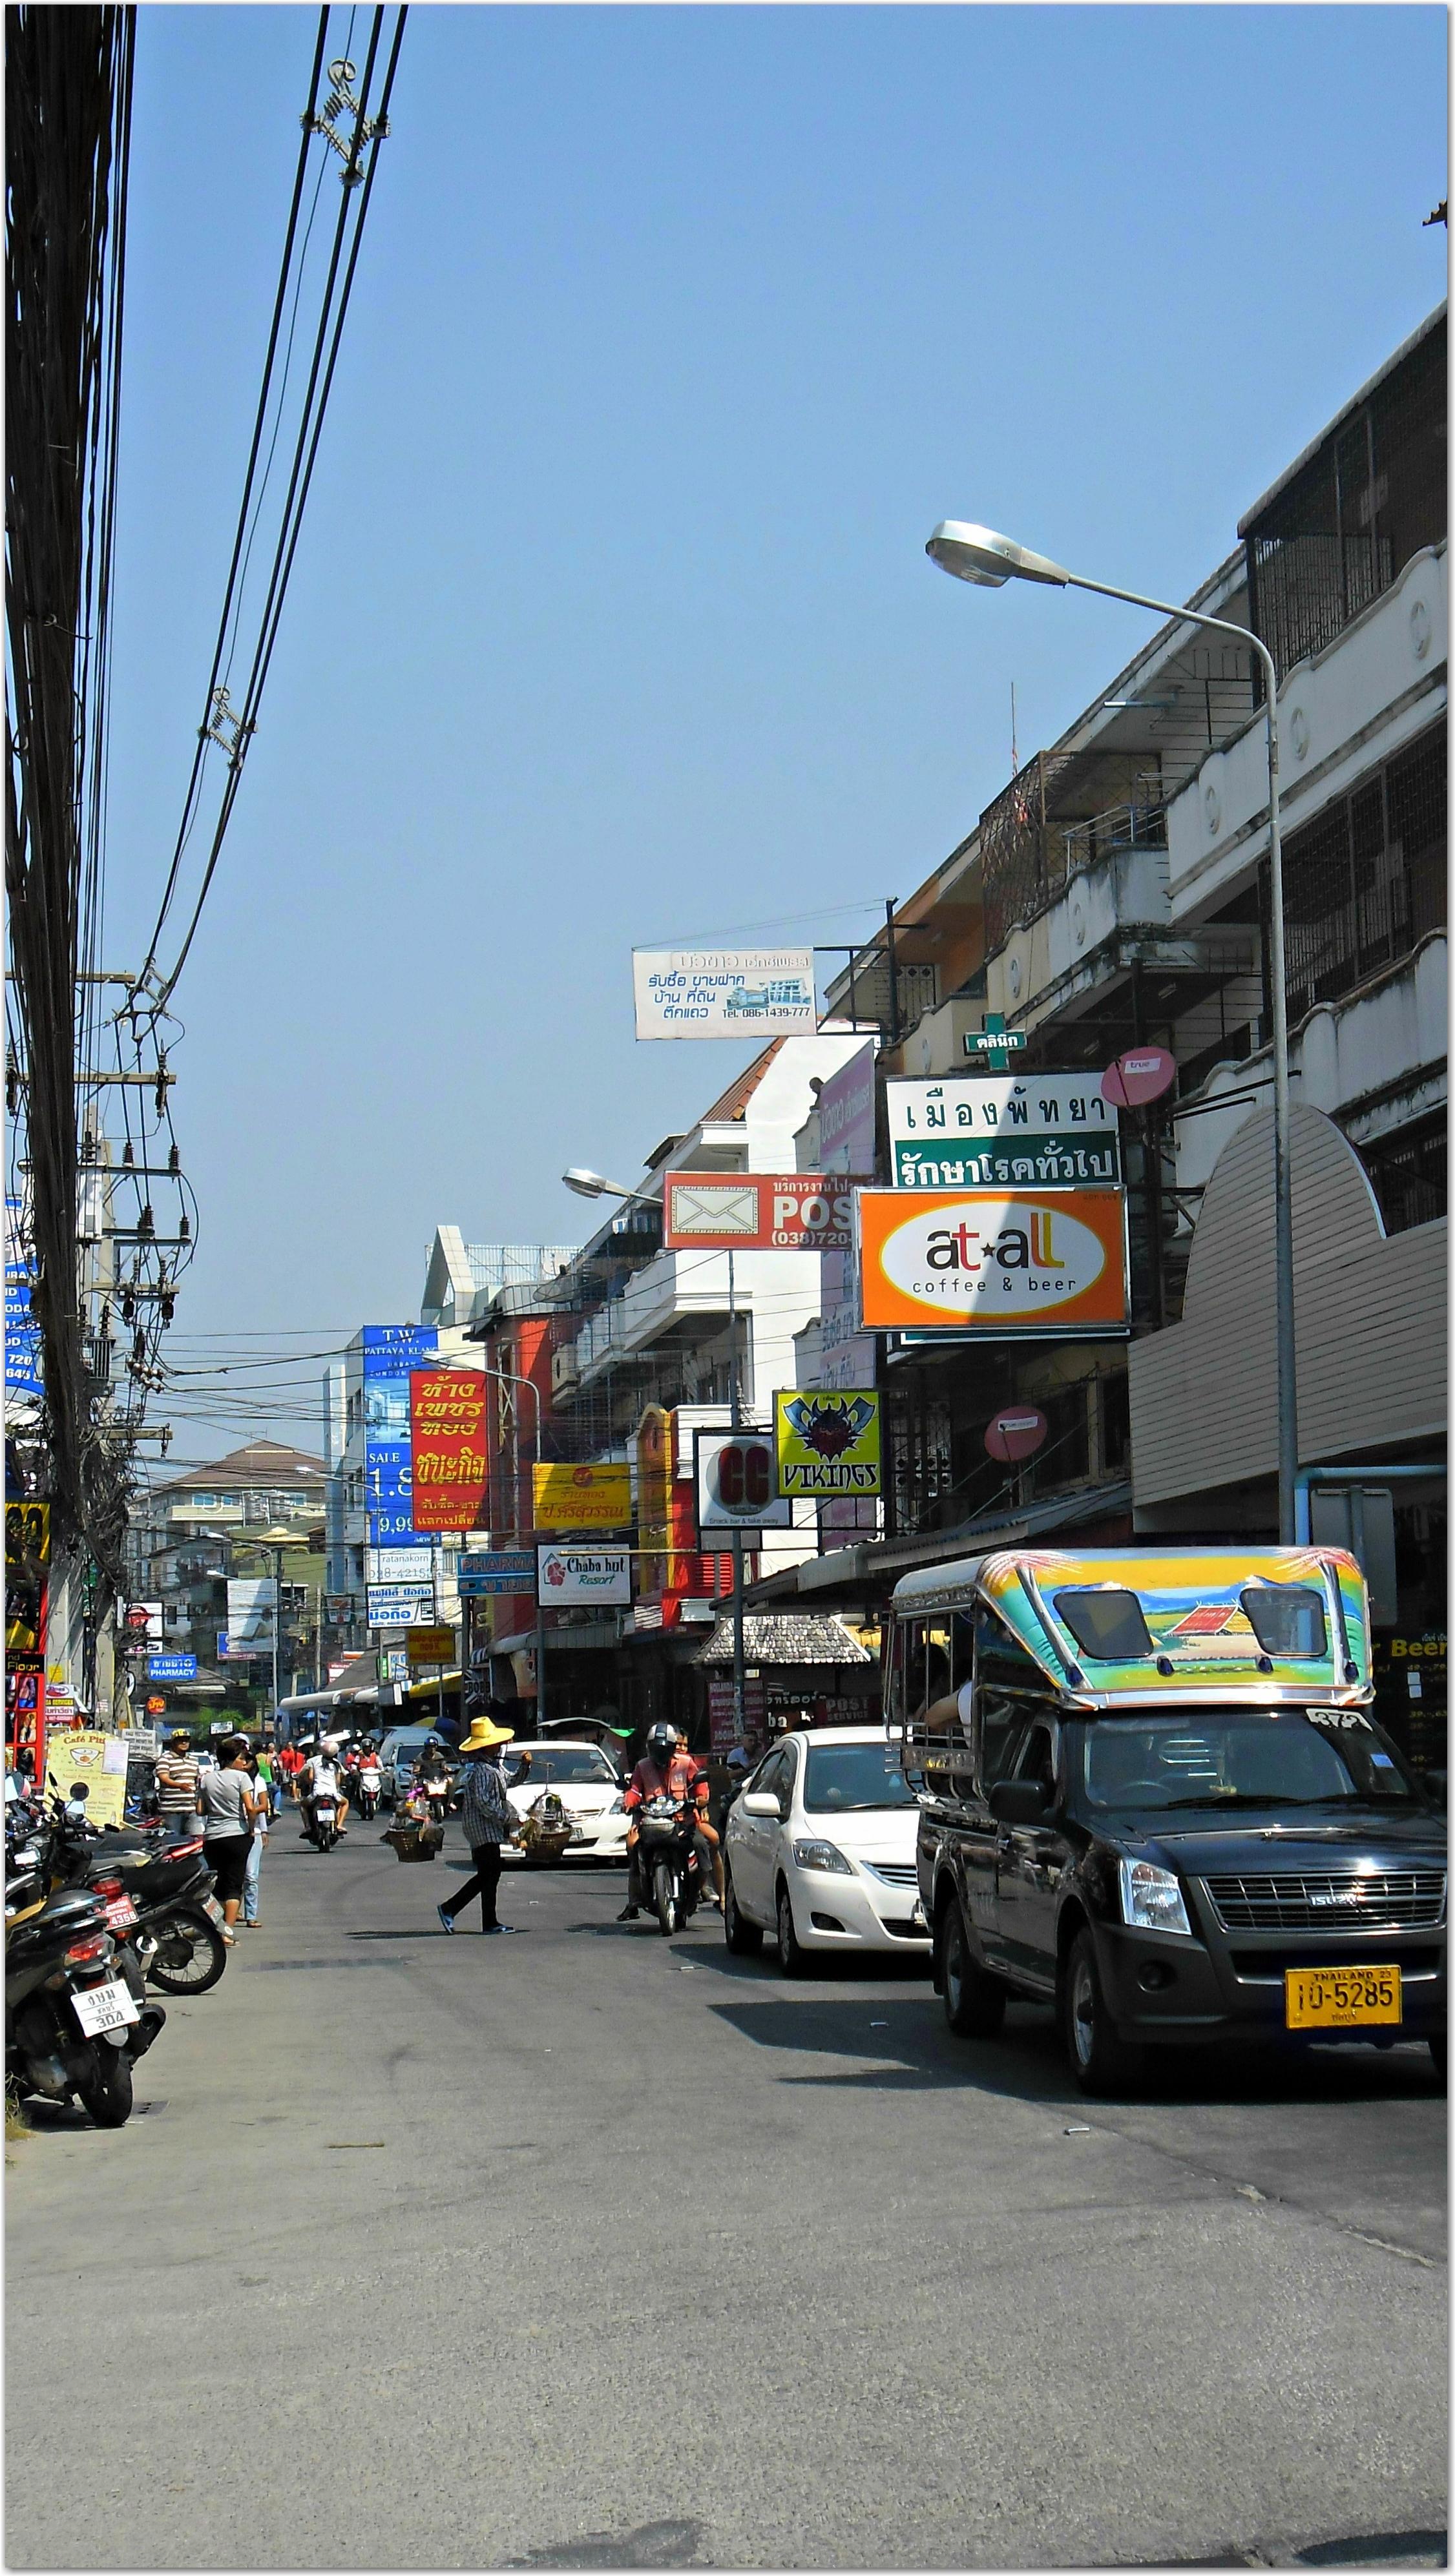 Soi LK Metro, Pattaya, Thailand